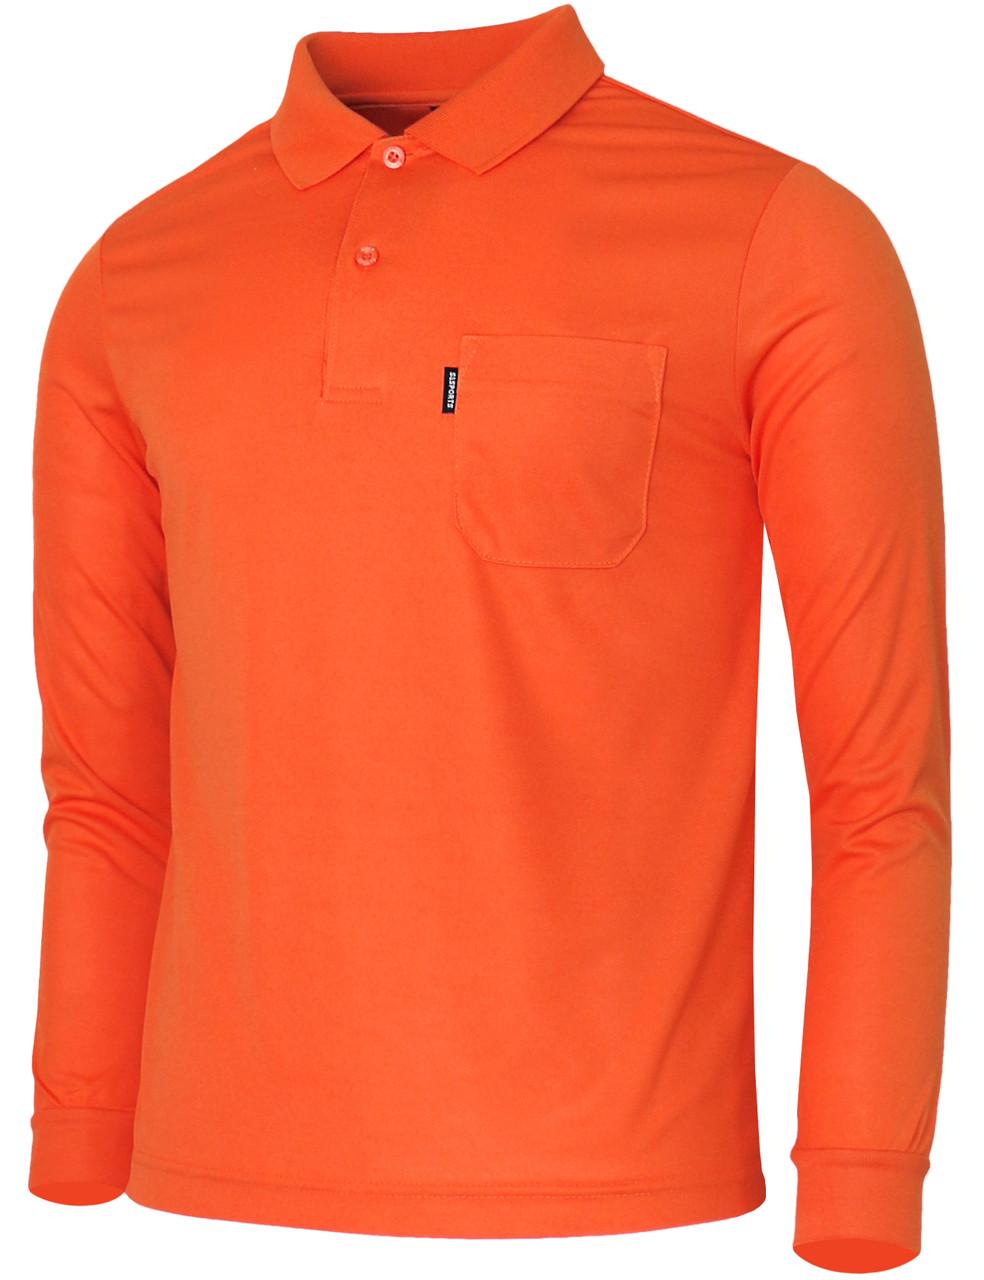 Coolon Polo T Shirt Long Sleeve T Shirt Aqua T Shirt Polo Shirt